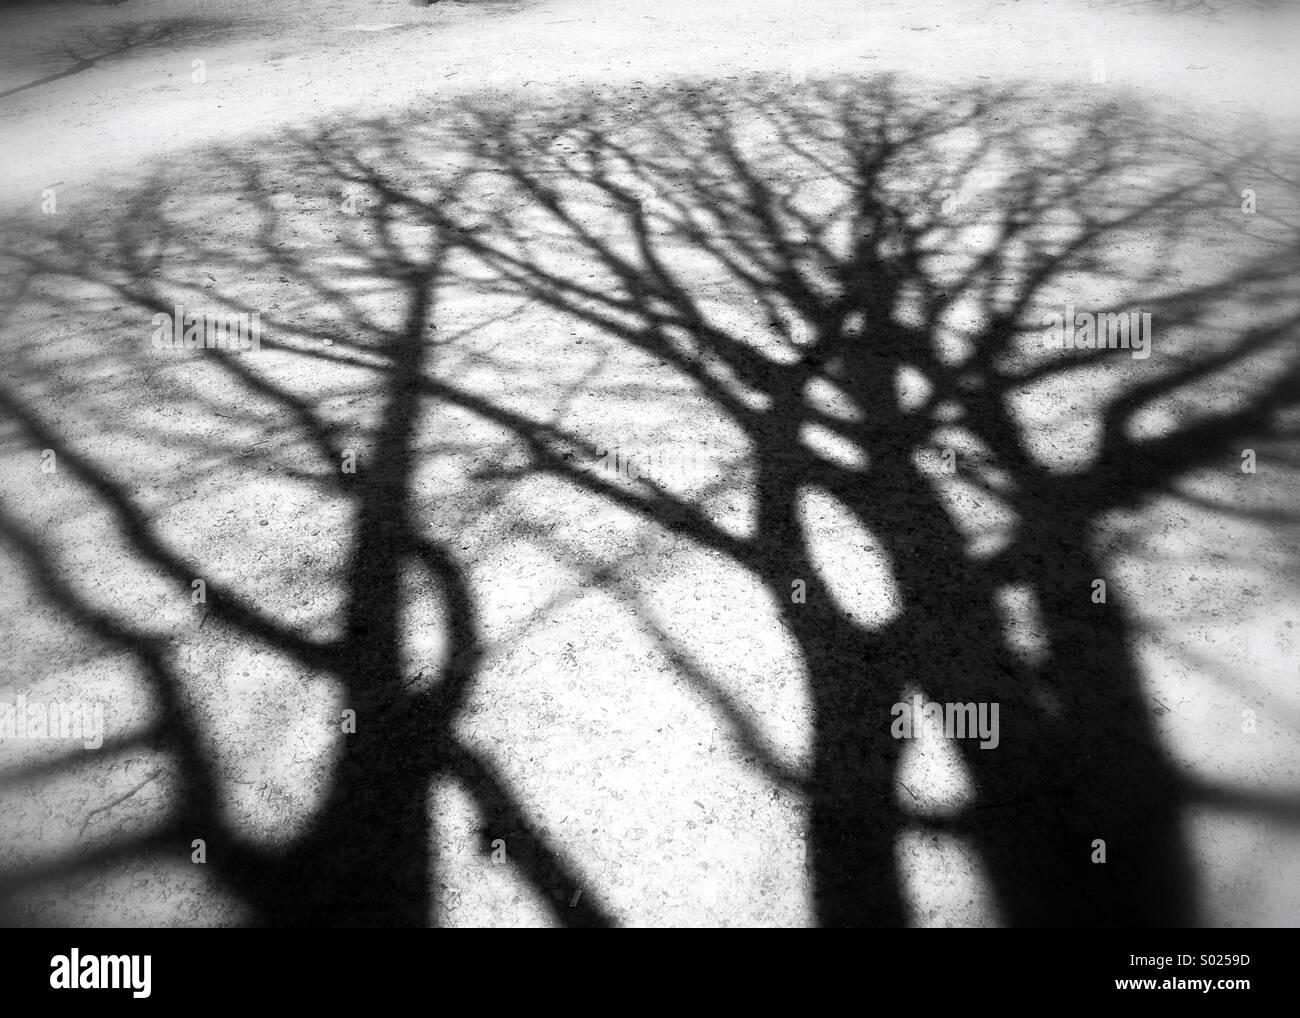 Shadows of brashes, trees shadows - Stock Image